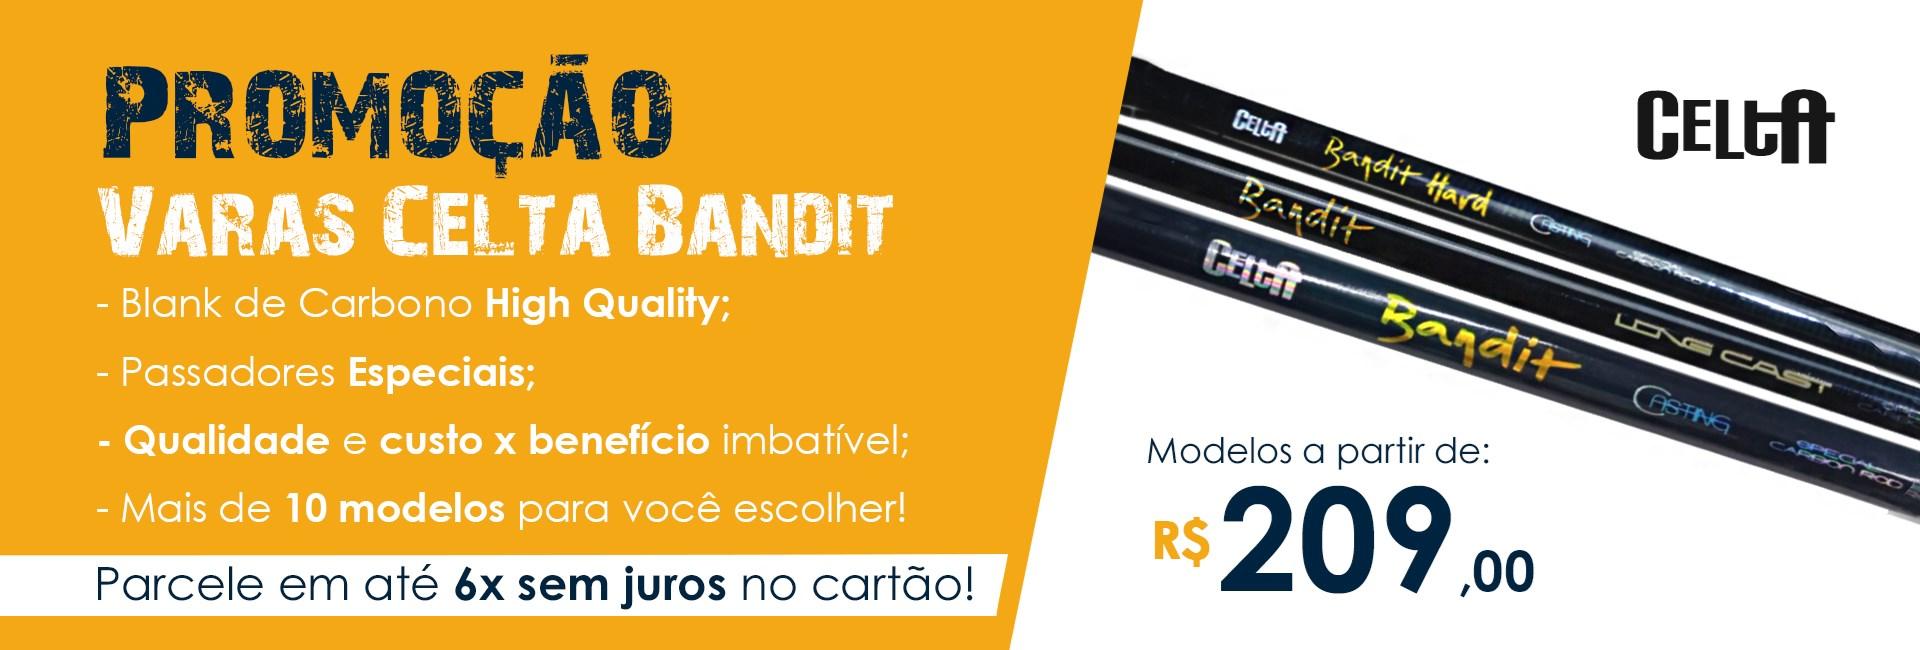 Vara Celta Bandit Nova Promoção